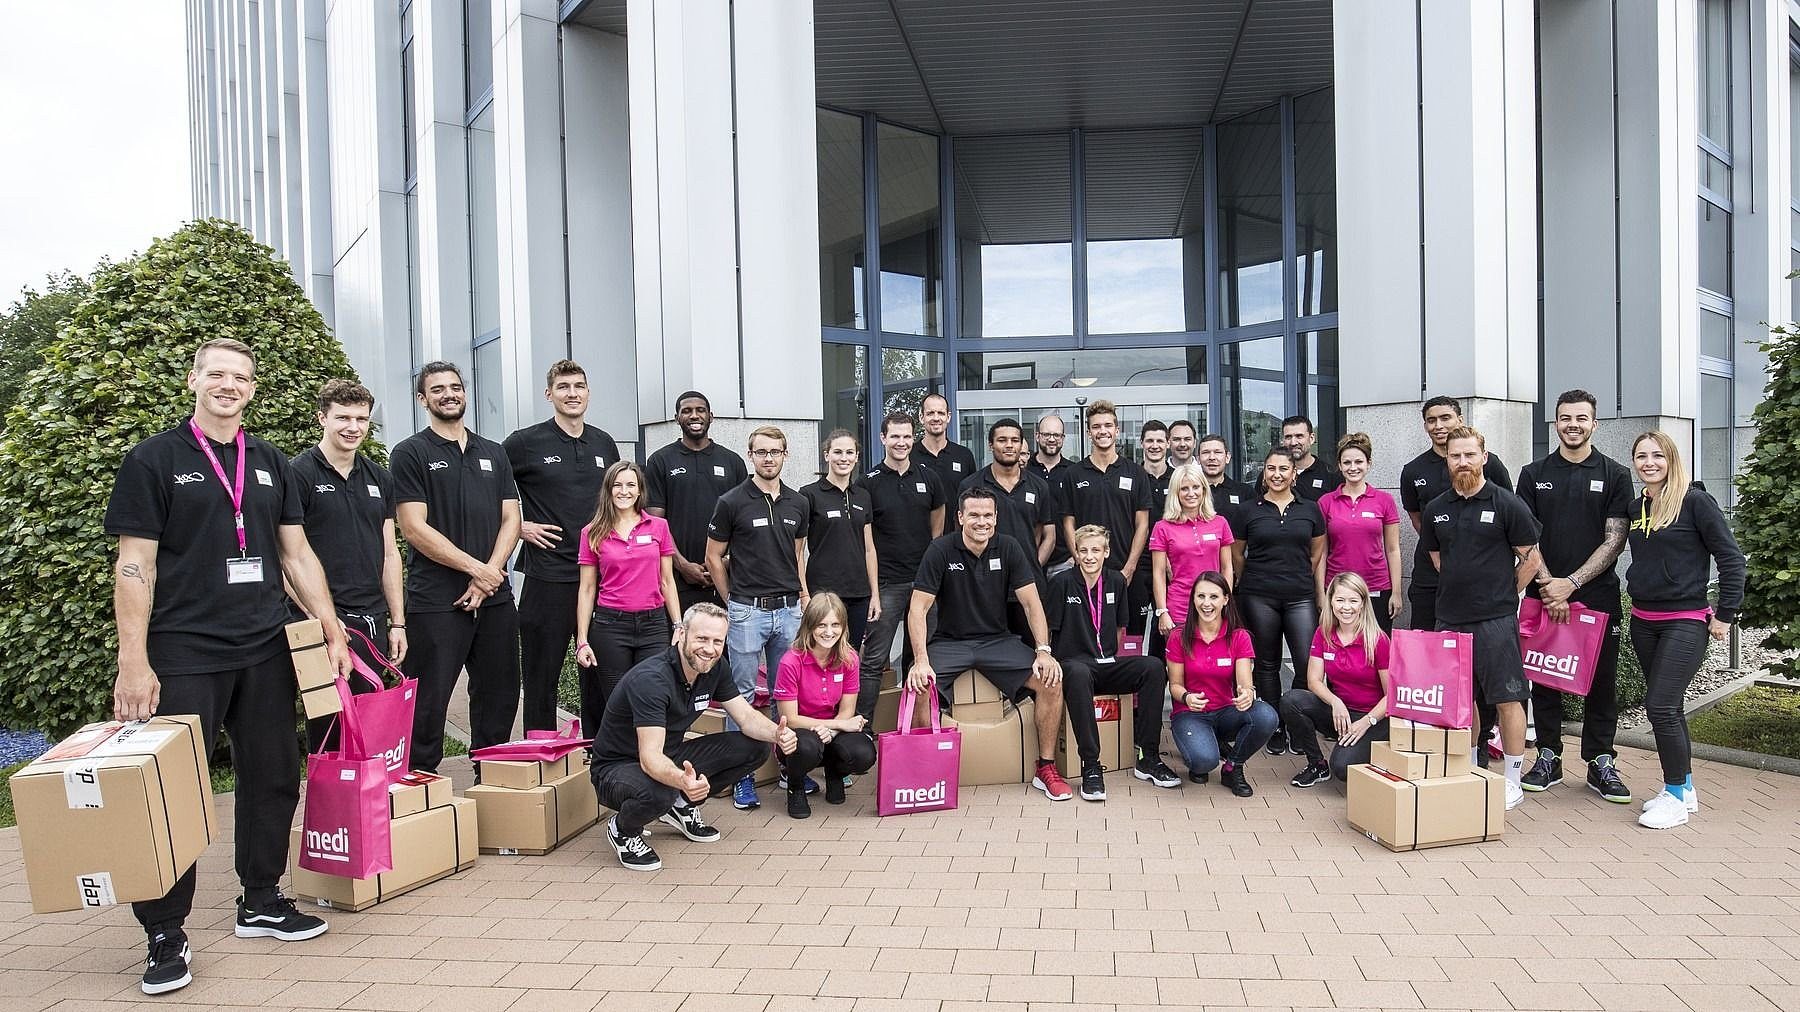 medi bayreuth group photograph